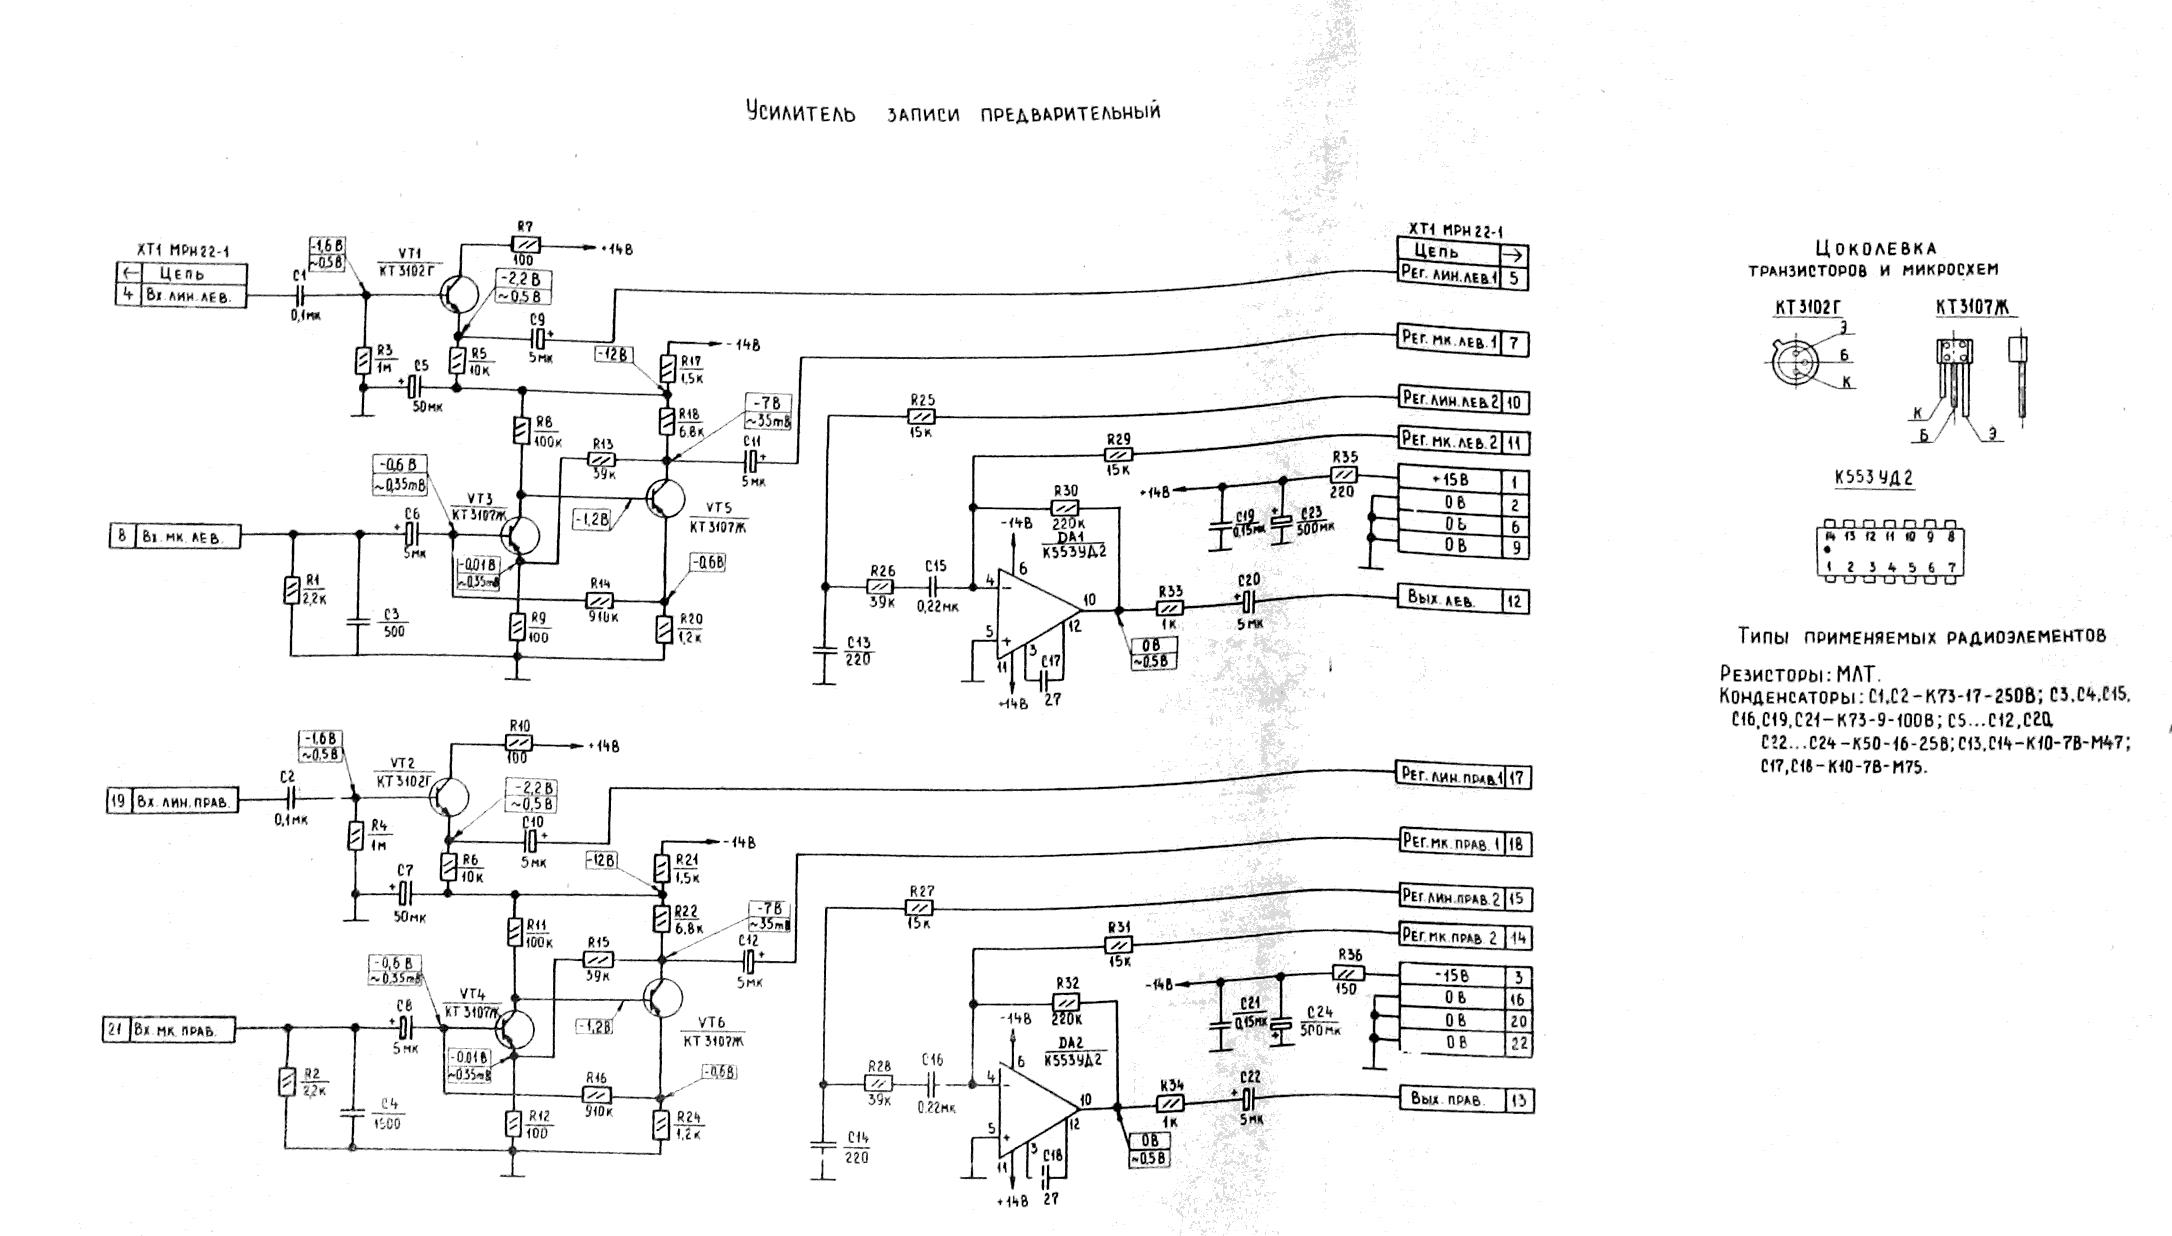 Катушечный магнитофон олимп 005 схема